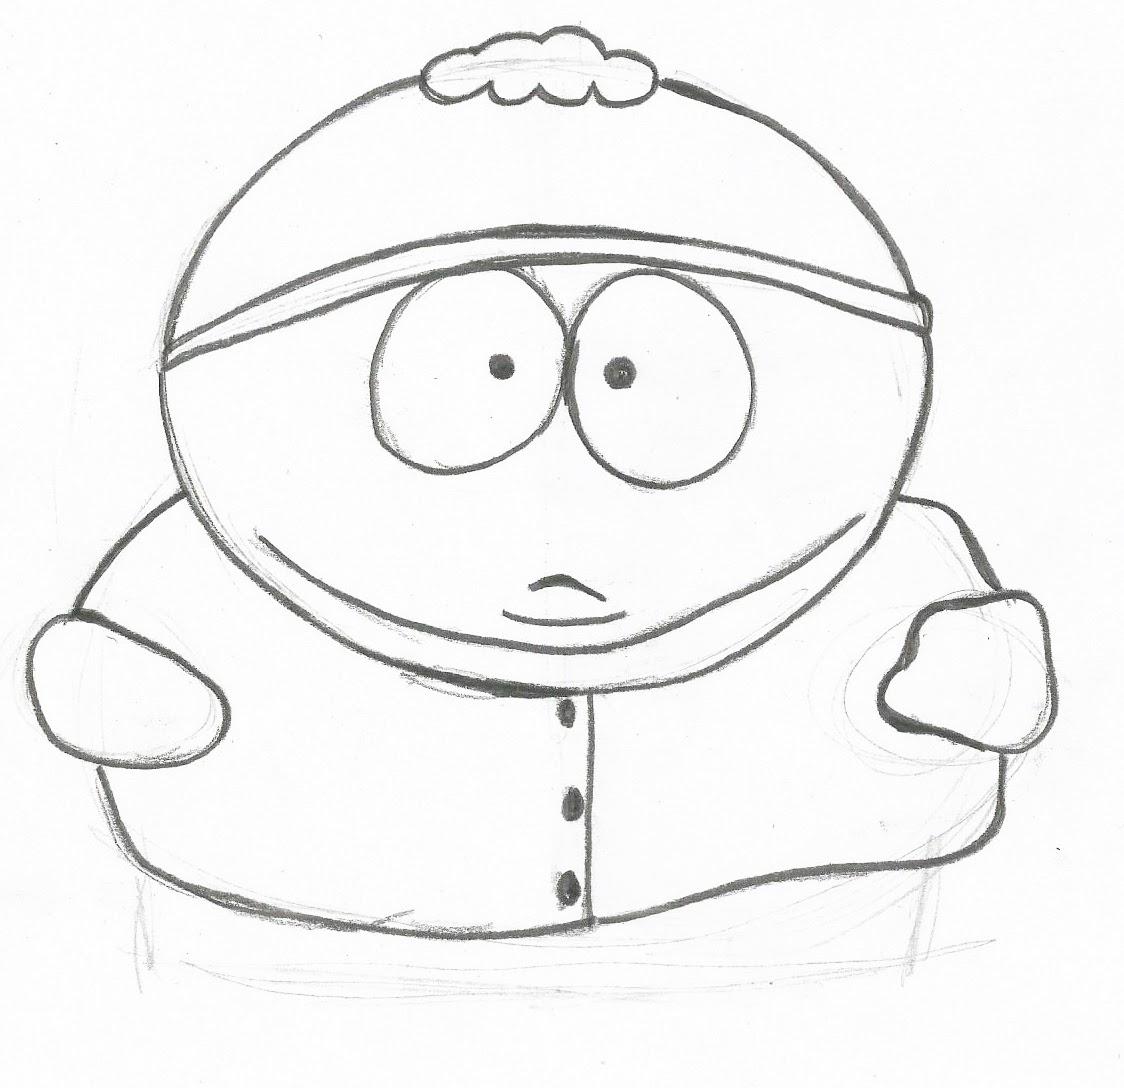 cartman south park coloring pages - photo#50